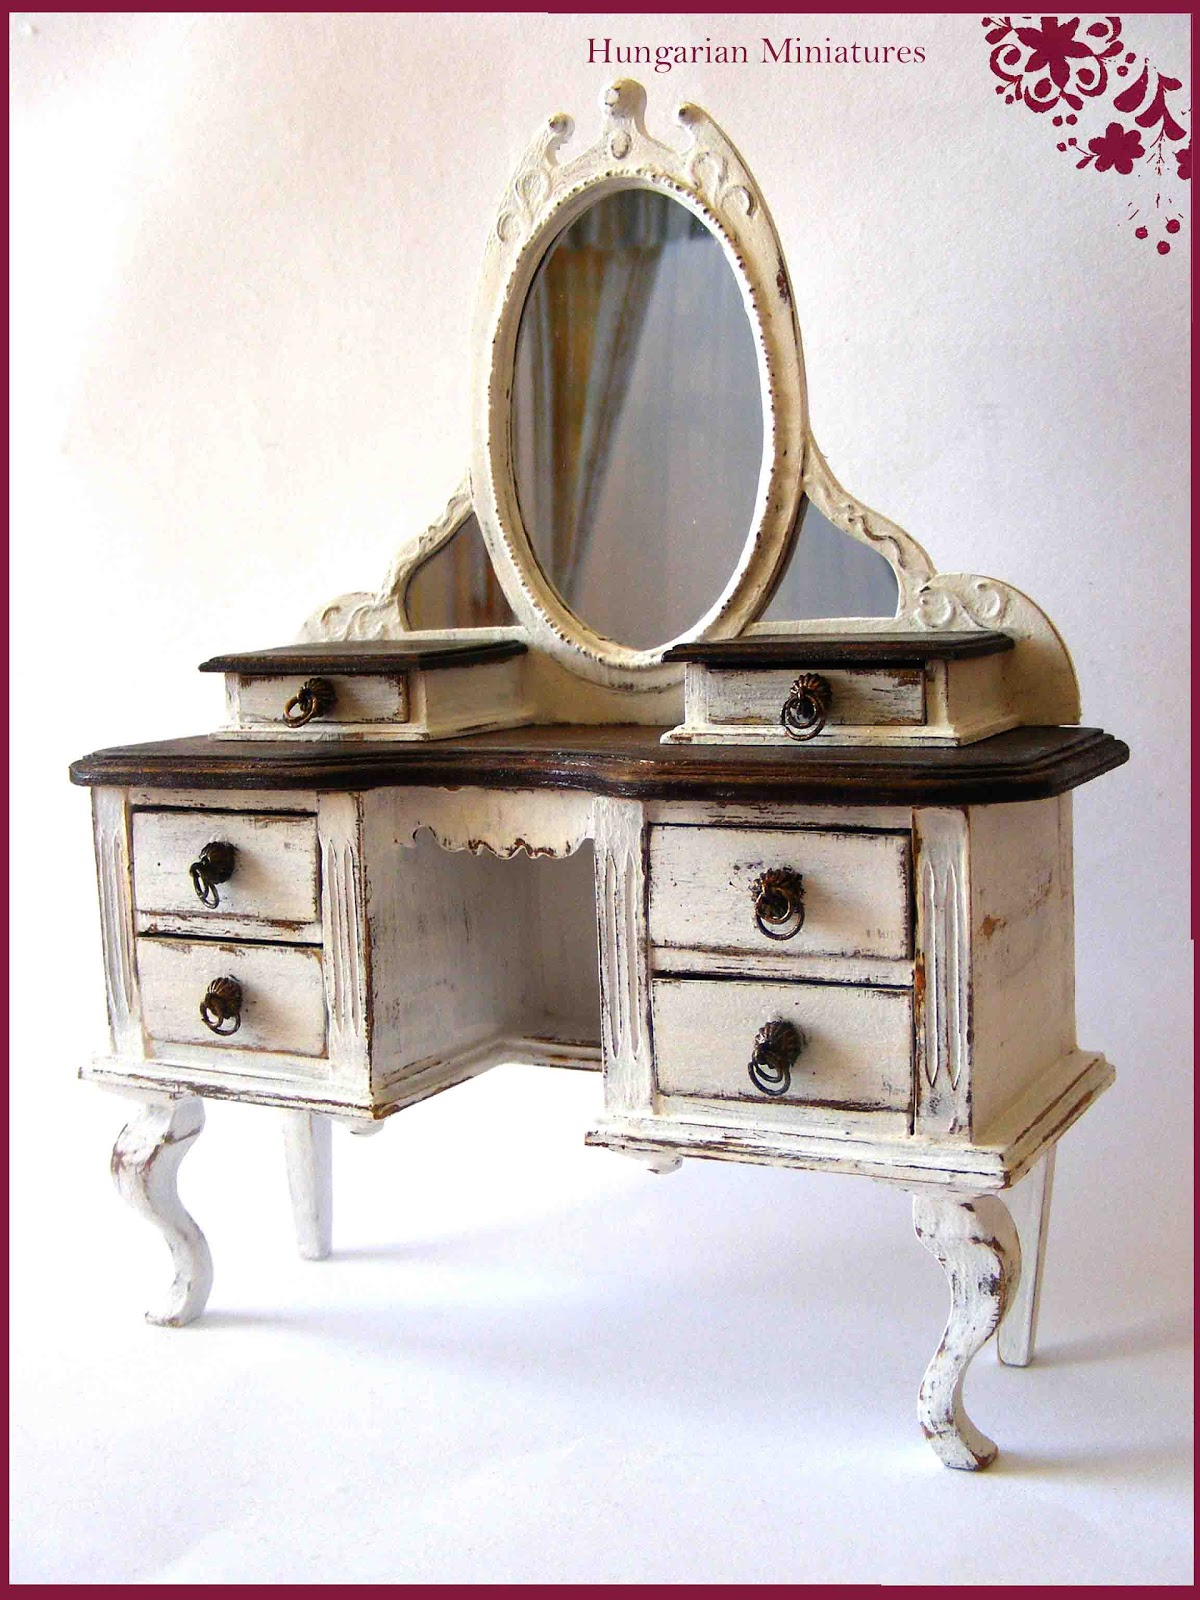 My tiny world: Dollhouse miniatures: Vanity table